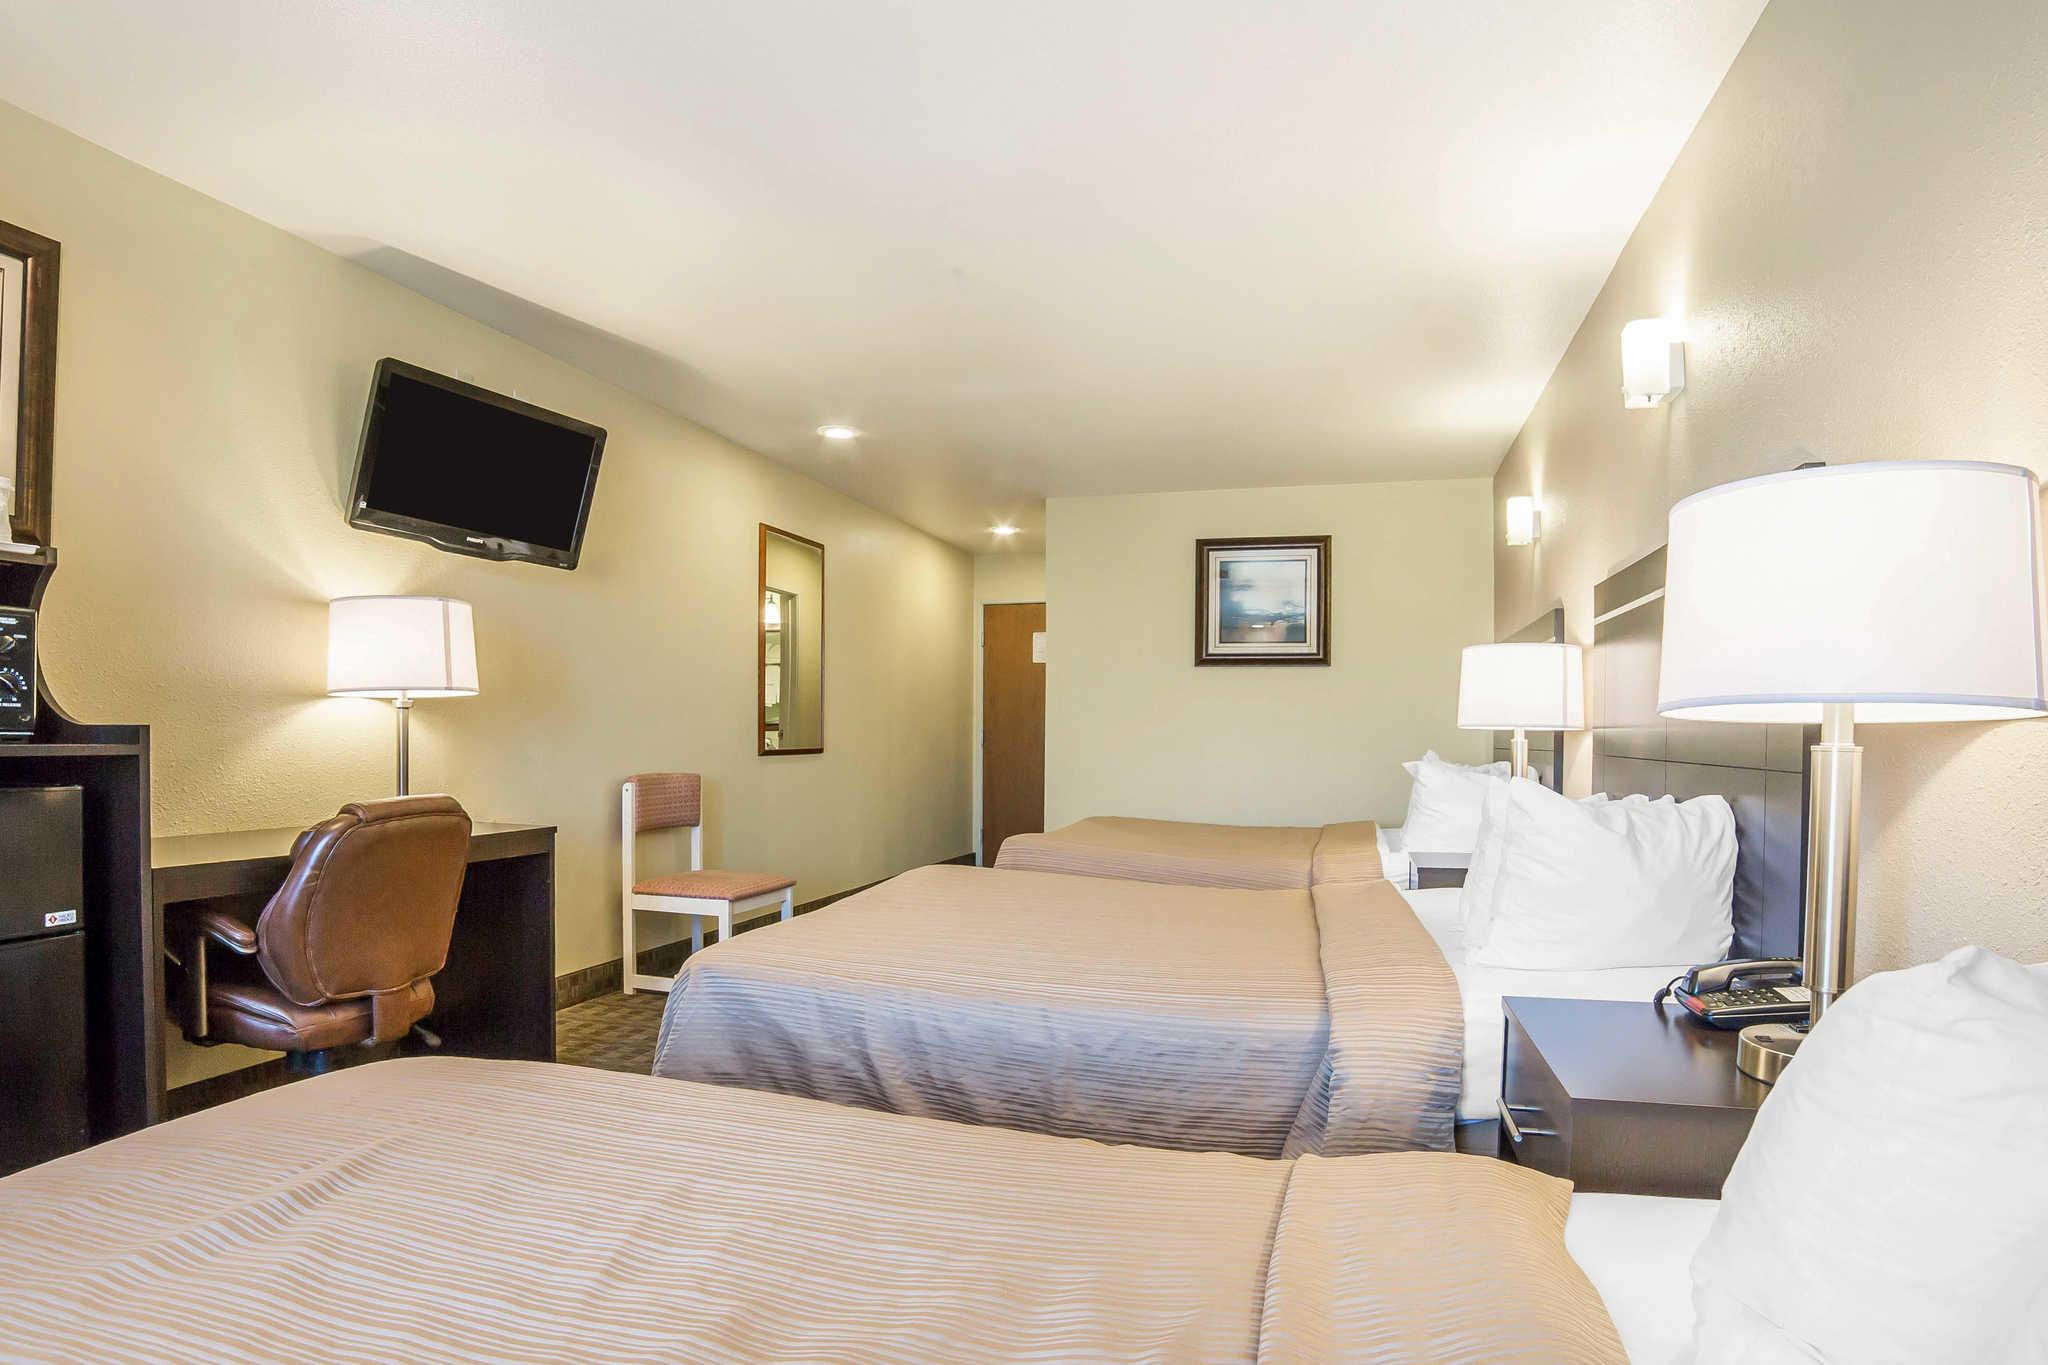 Quality Inn & Suites Elko image 22